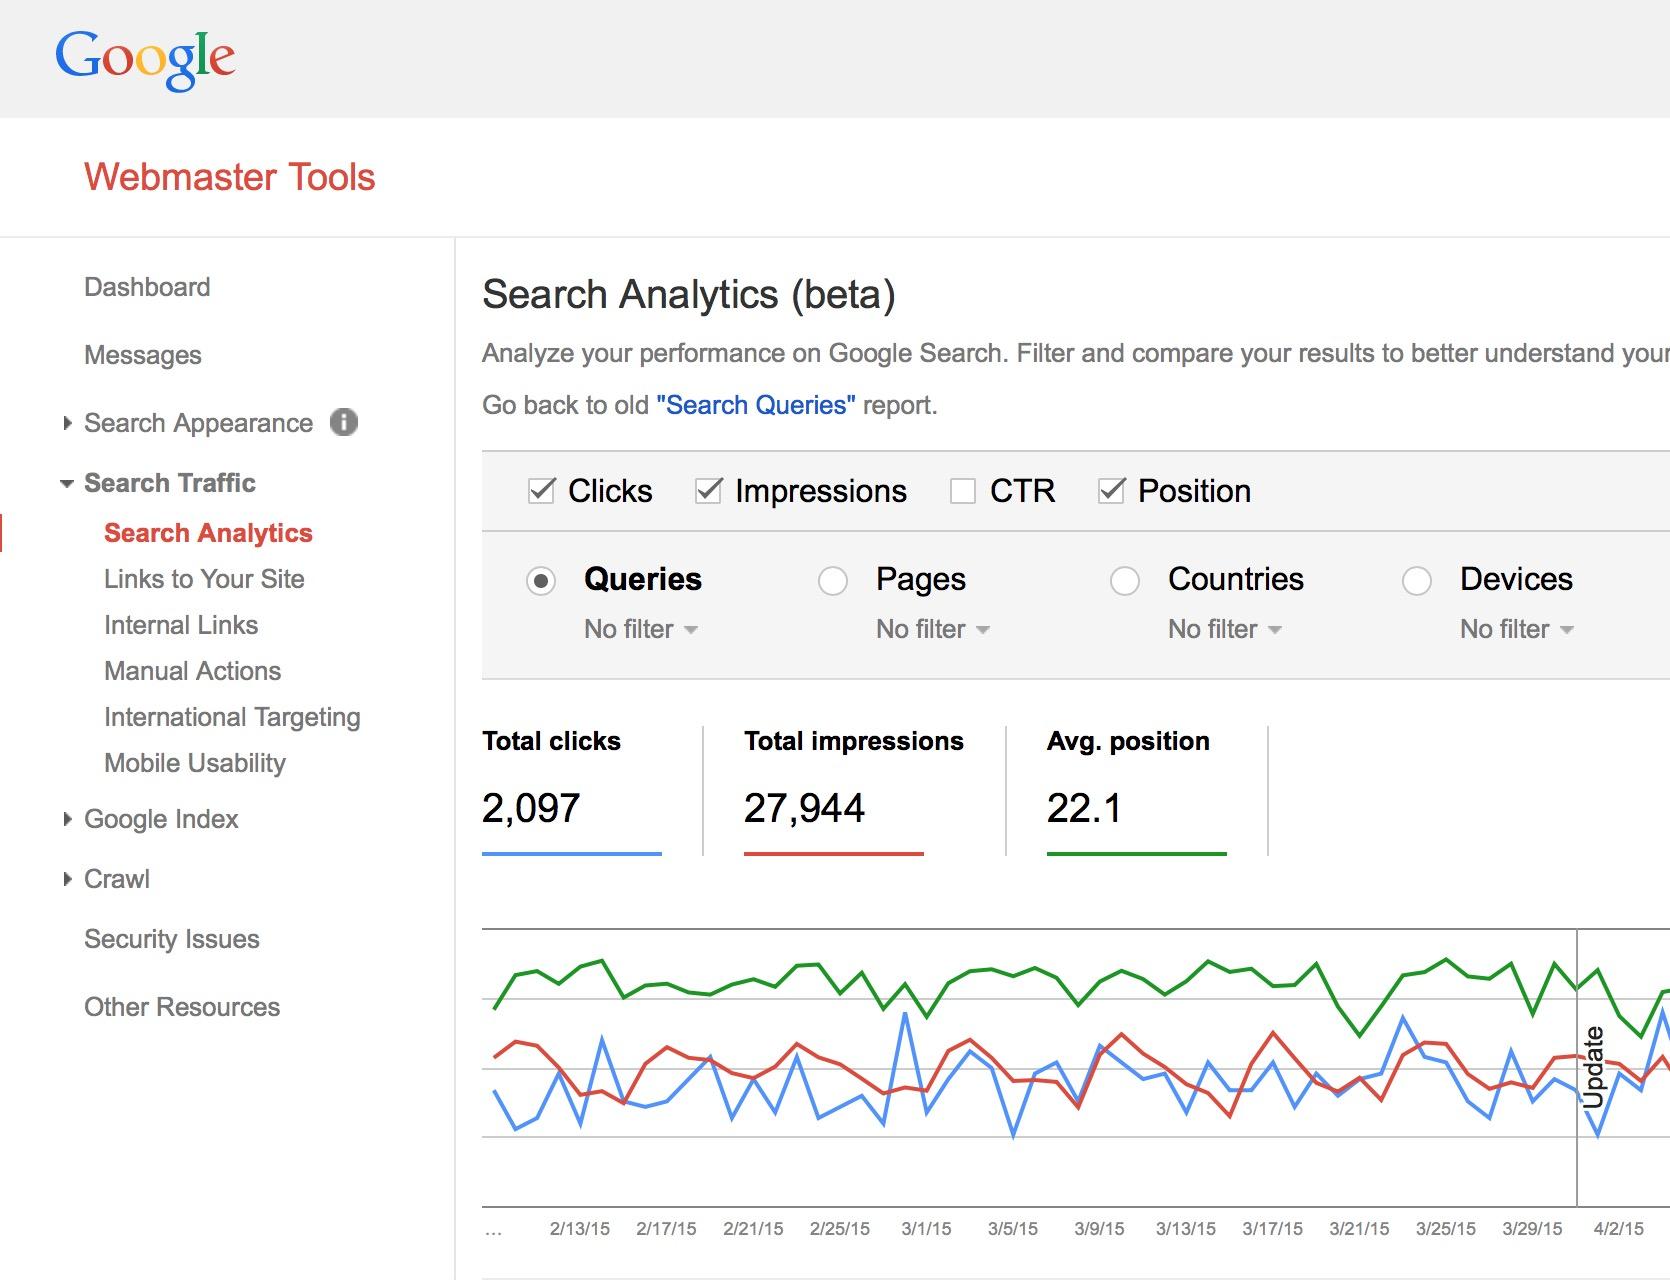 google webmaster tools for SEO monitoring